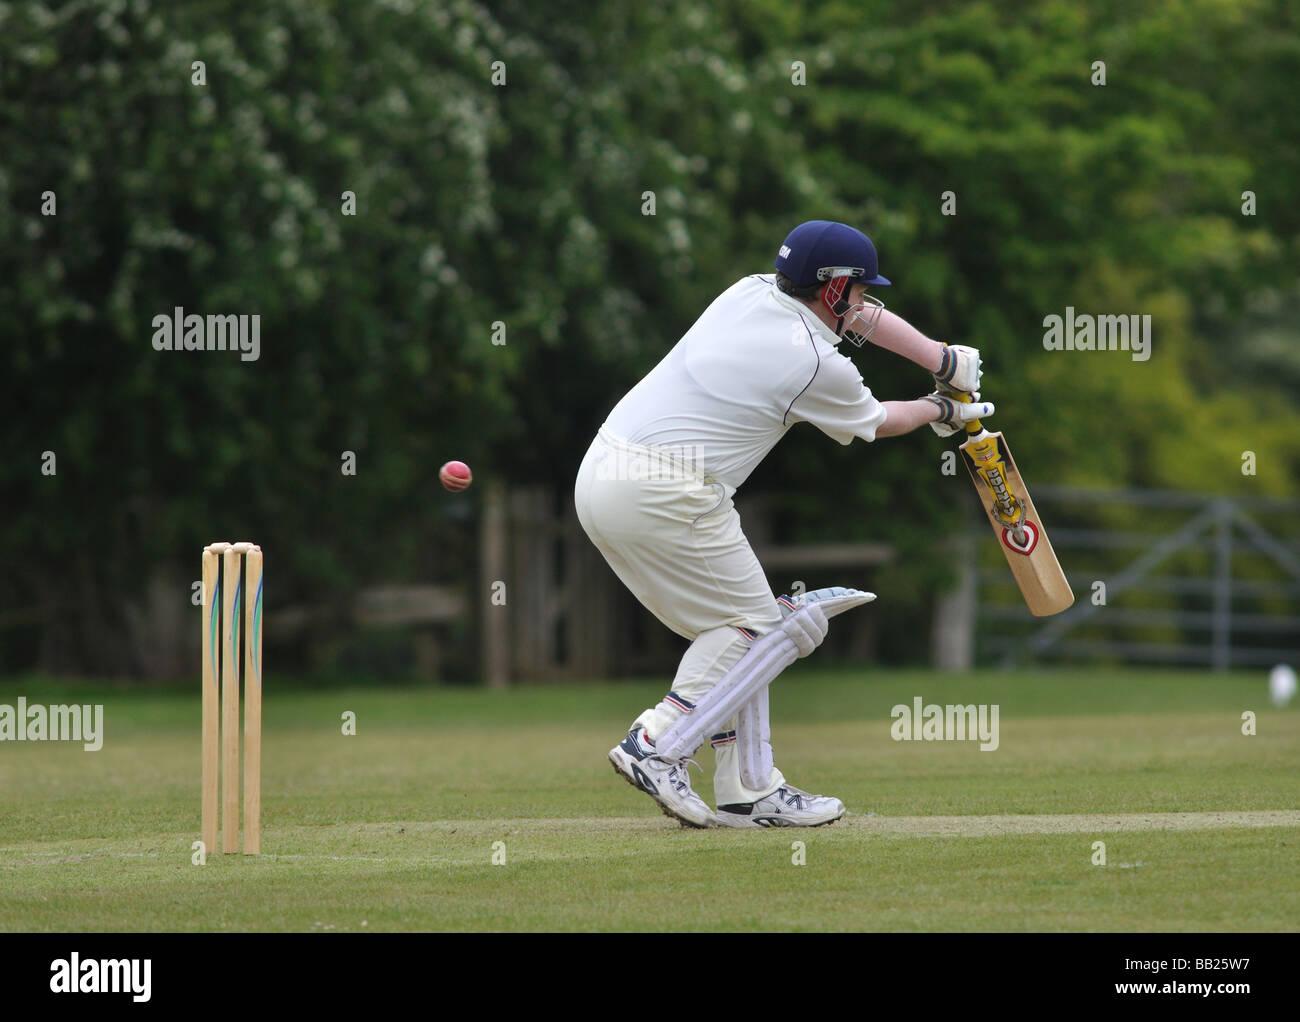 Aldea cricket en Lapworth, Warwickshire, Inglaterra, Reino Unido. Imagen De Stock